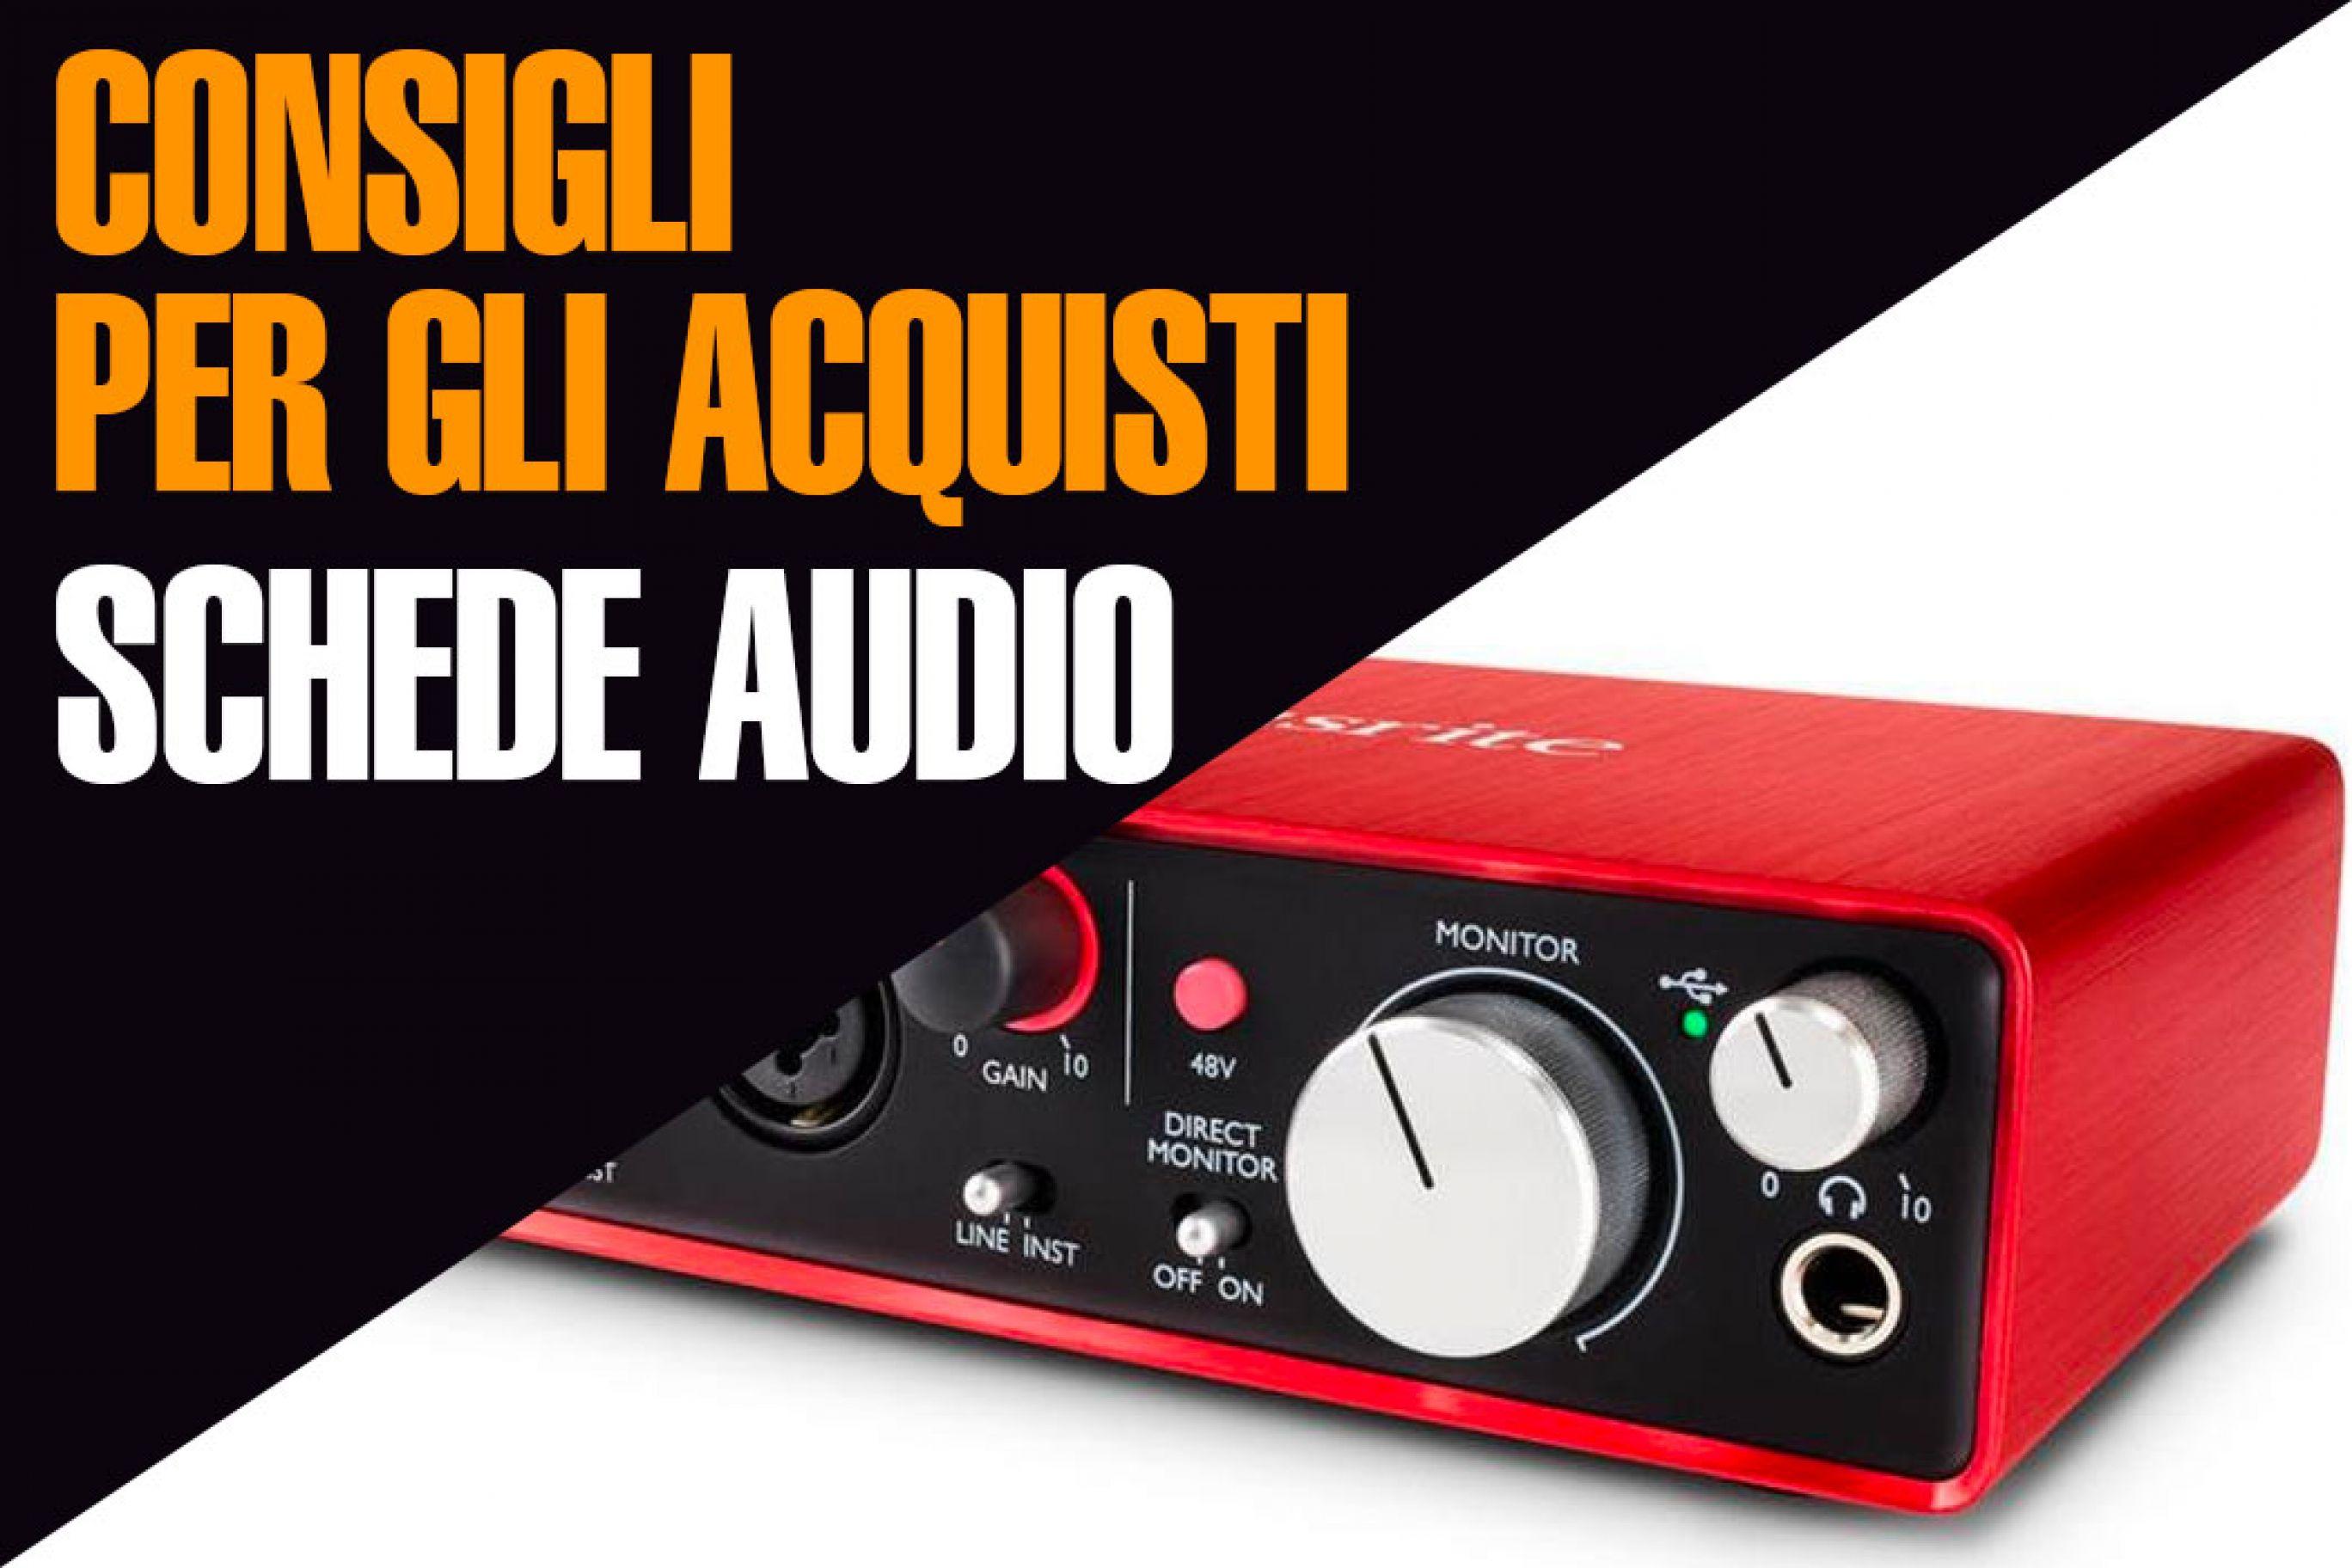 Scheda audio esterna, quale scegliere: Universal Audio, Focusrite o M-Audio?